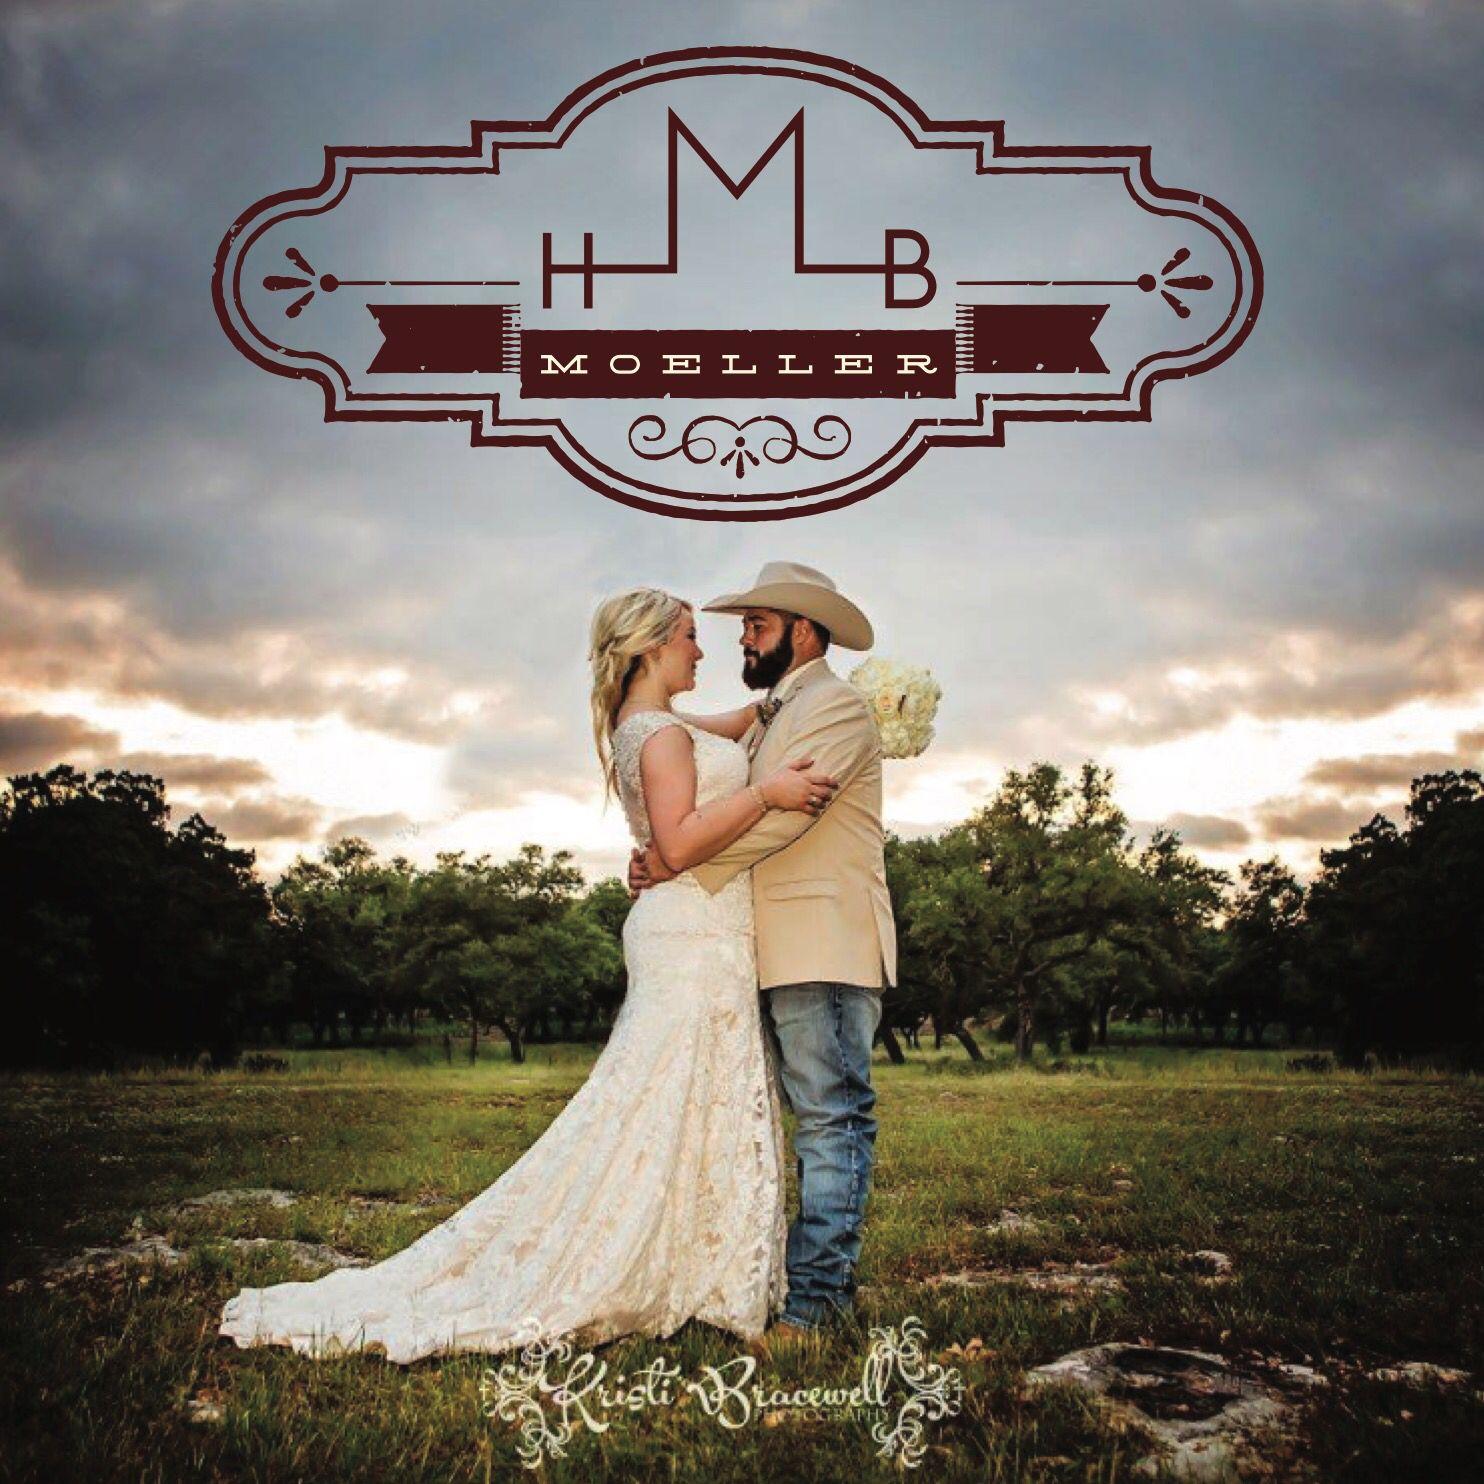 Wedding Branding Ideas: Wedding Monogram / Western Monogram/ Cattle Brand Designed